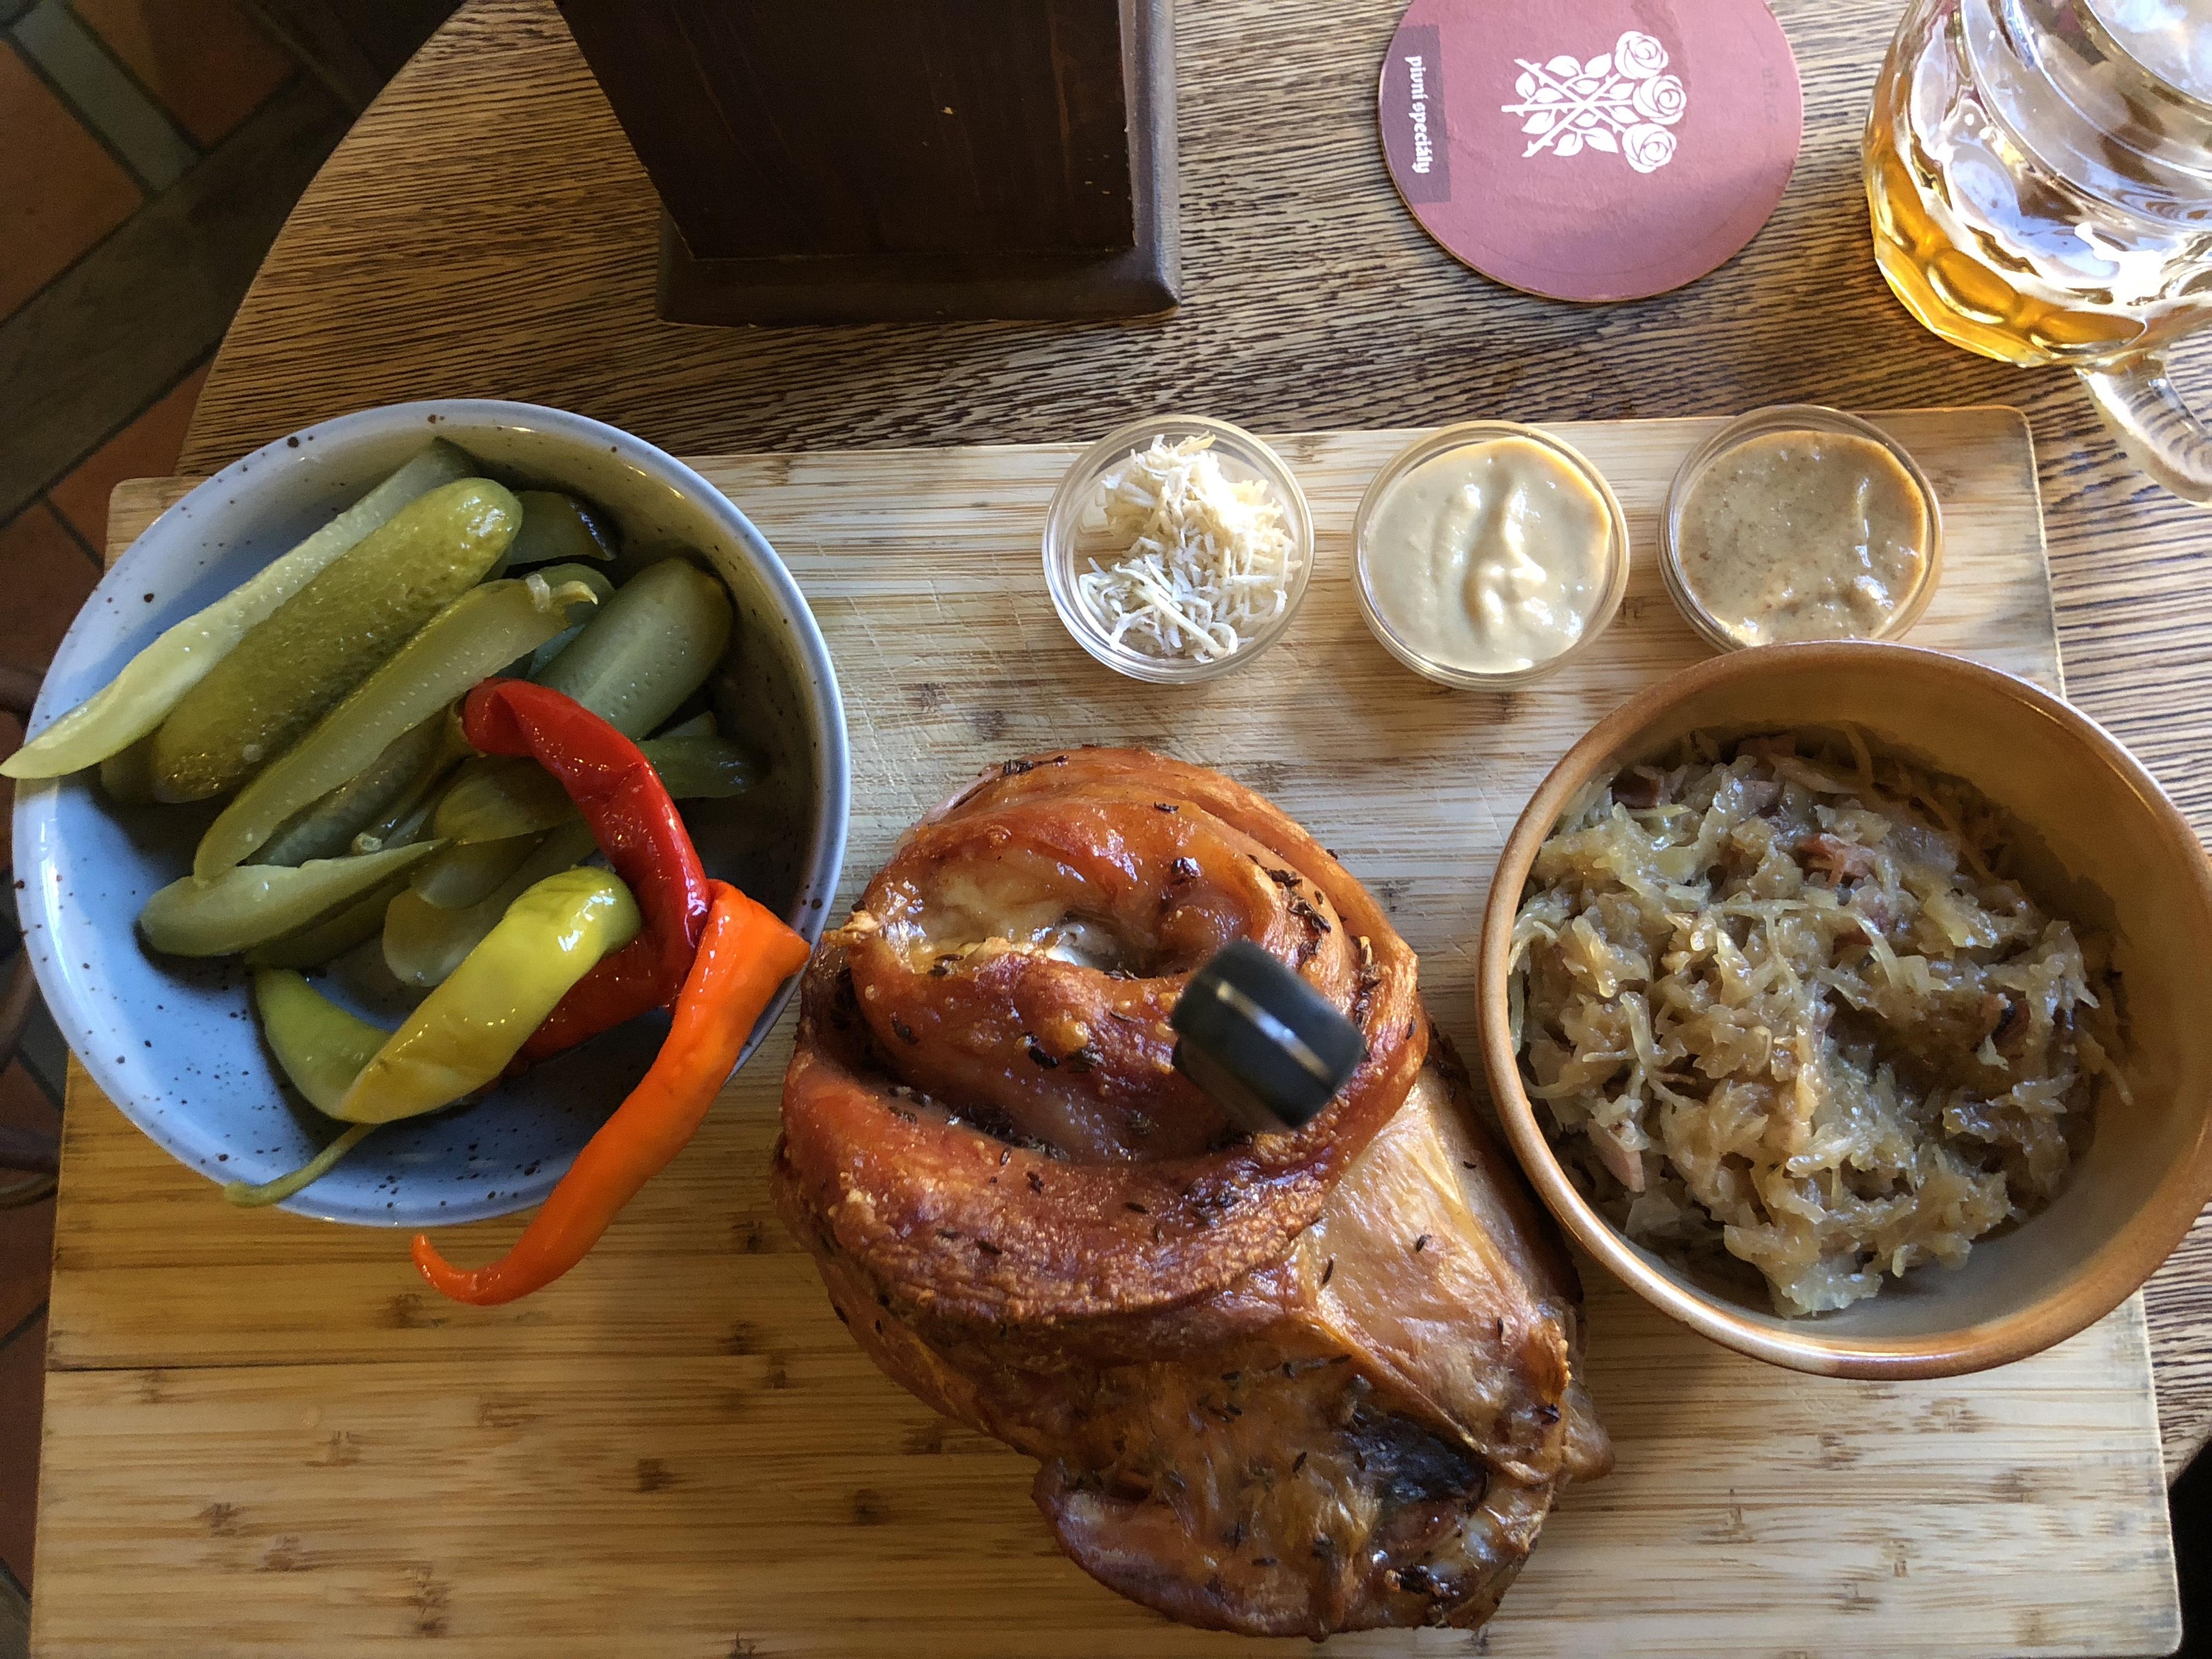 Pork Knuckle at Pivovar U Tří růží